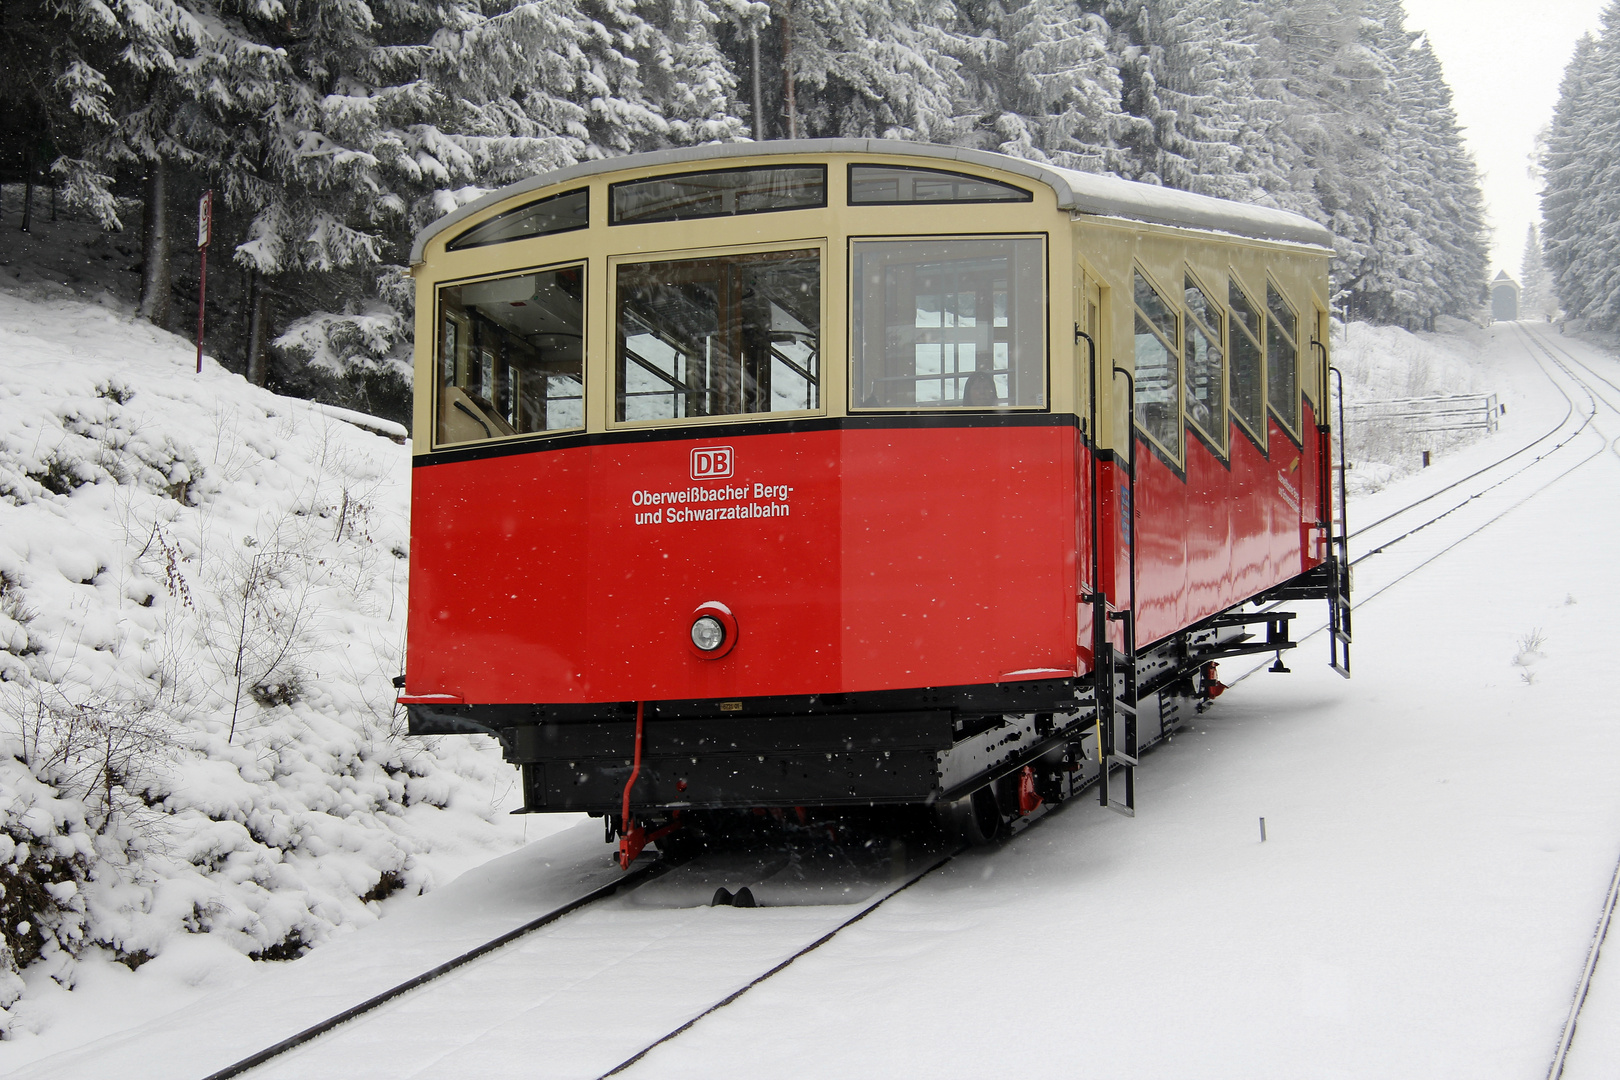 Oberweißbacher Bergbahn (Personenwagen)